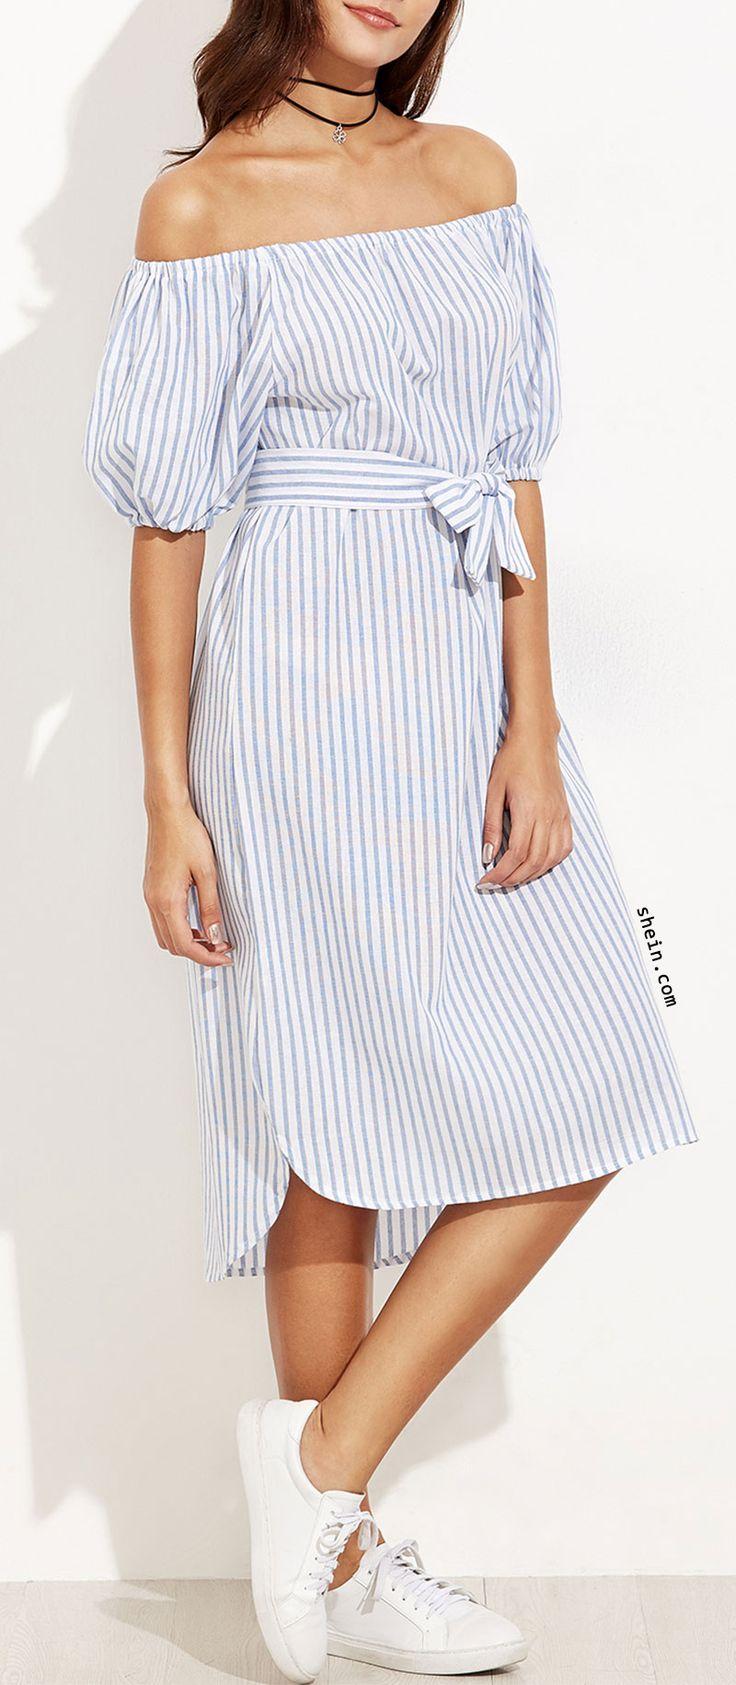 Blue Vertical Striped Off The Shoulder Self Tie Dress